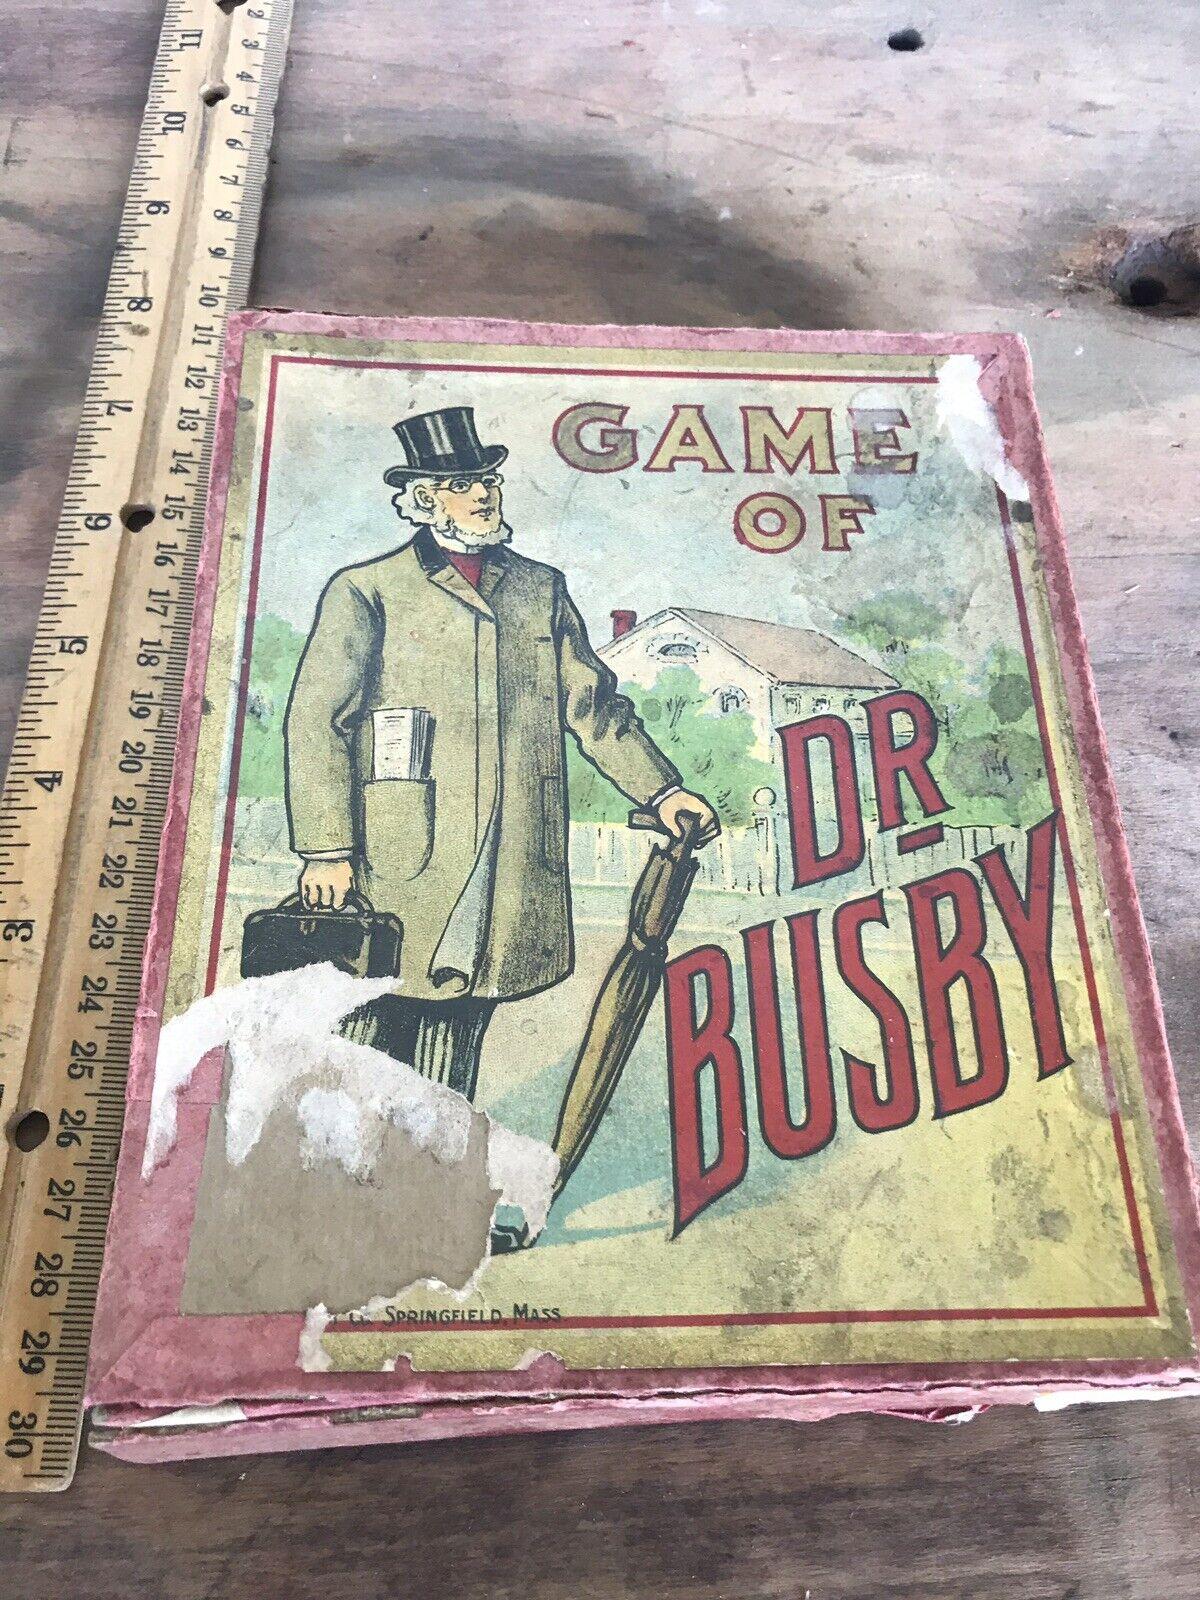 Raro Dr Busby Milton Bradly Juego de Cartas Raras tarjetas 20 increíble tarjeta original 1905